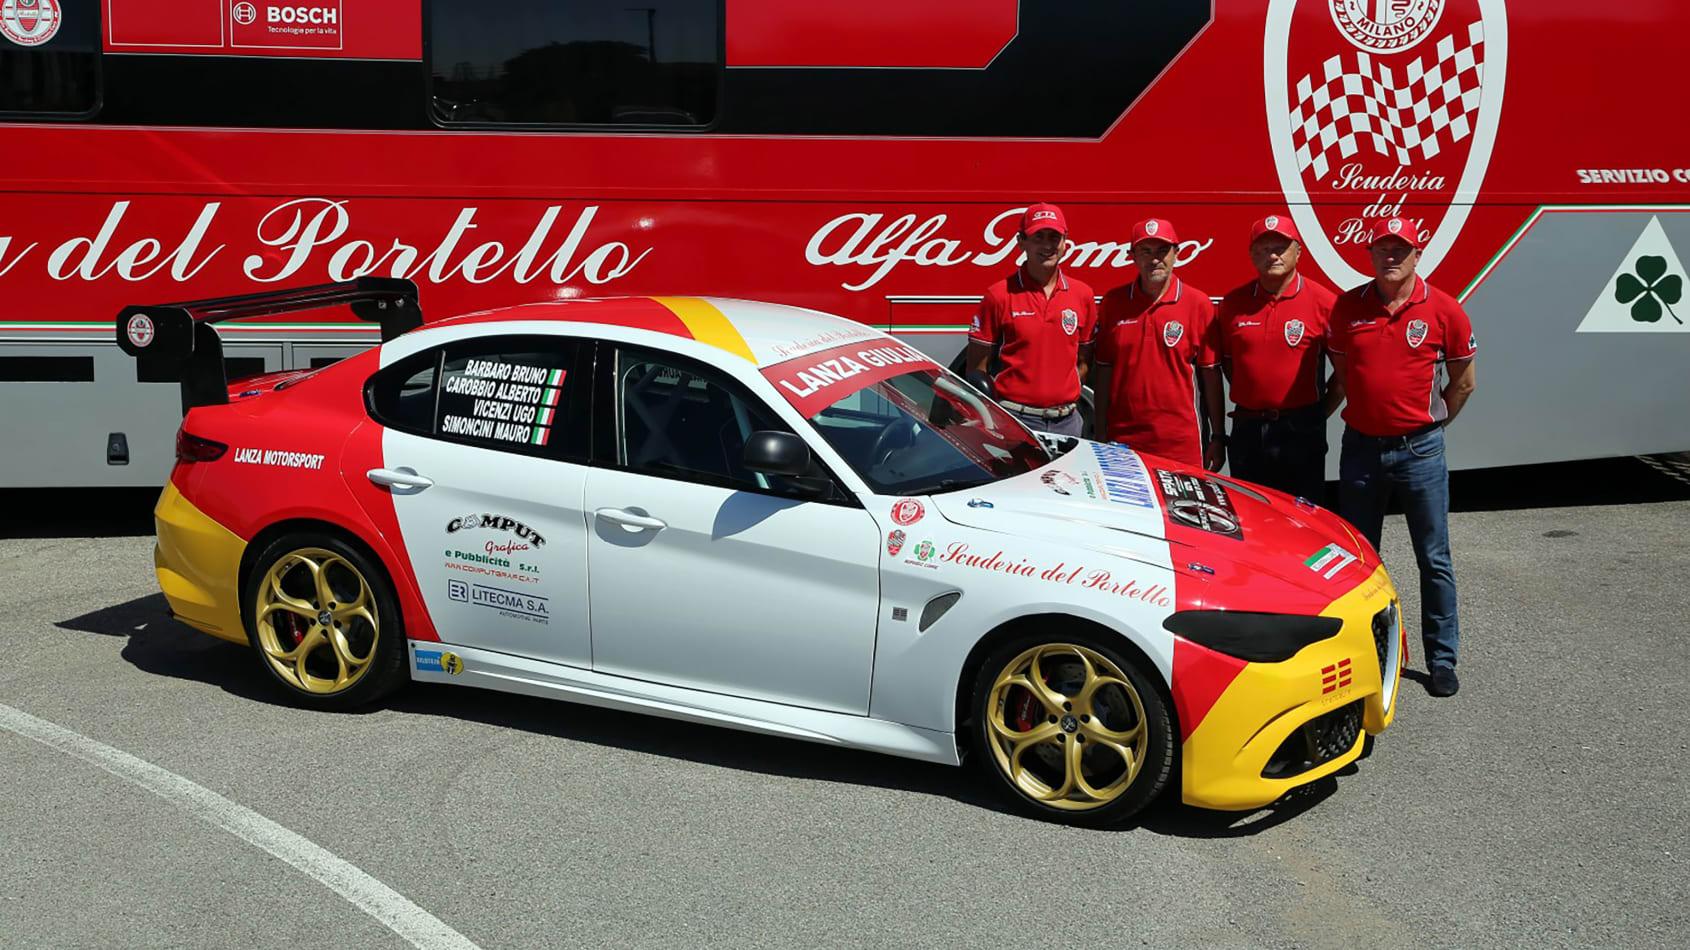 Alfa_Romeo_Giulia_Quadrifoglio_N24_0008